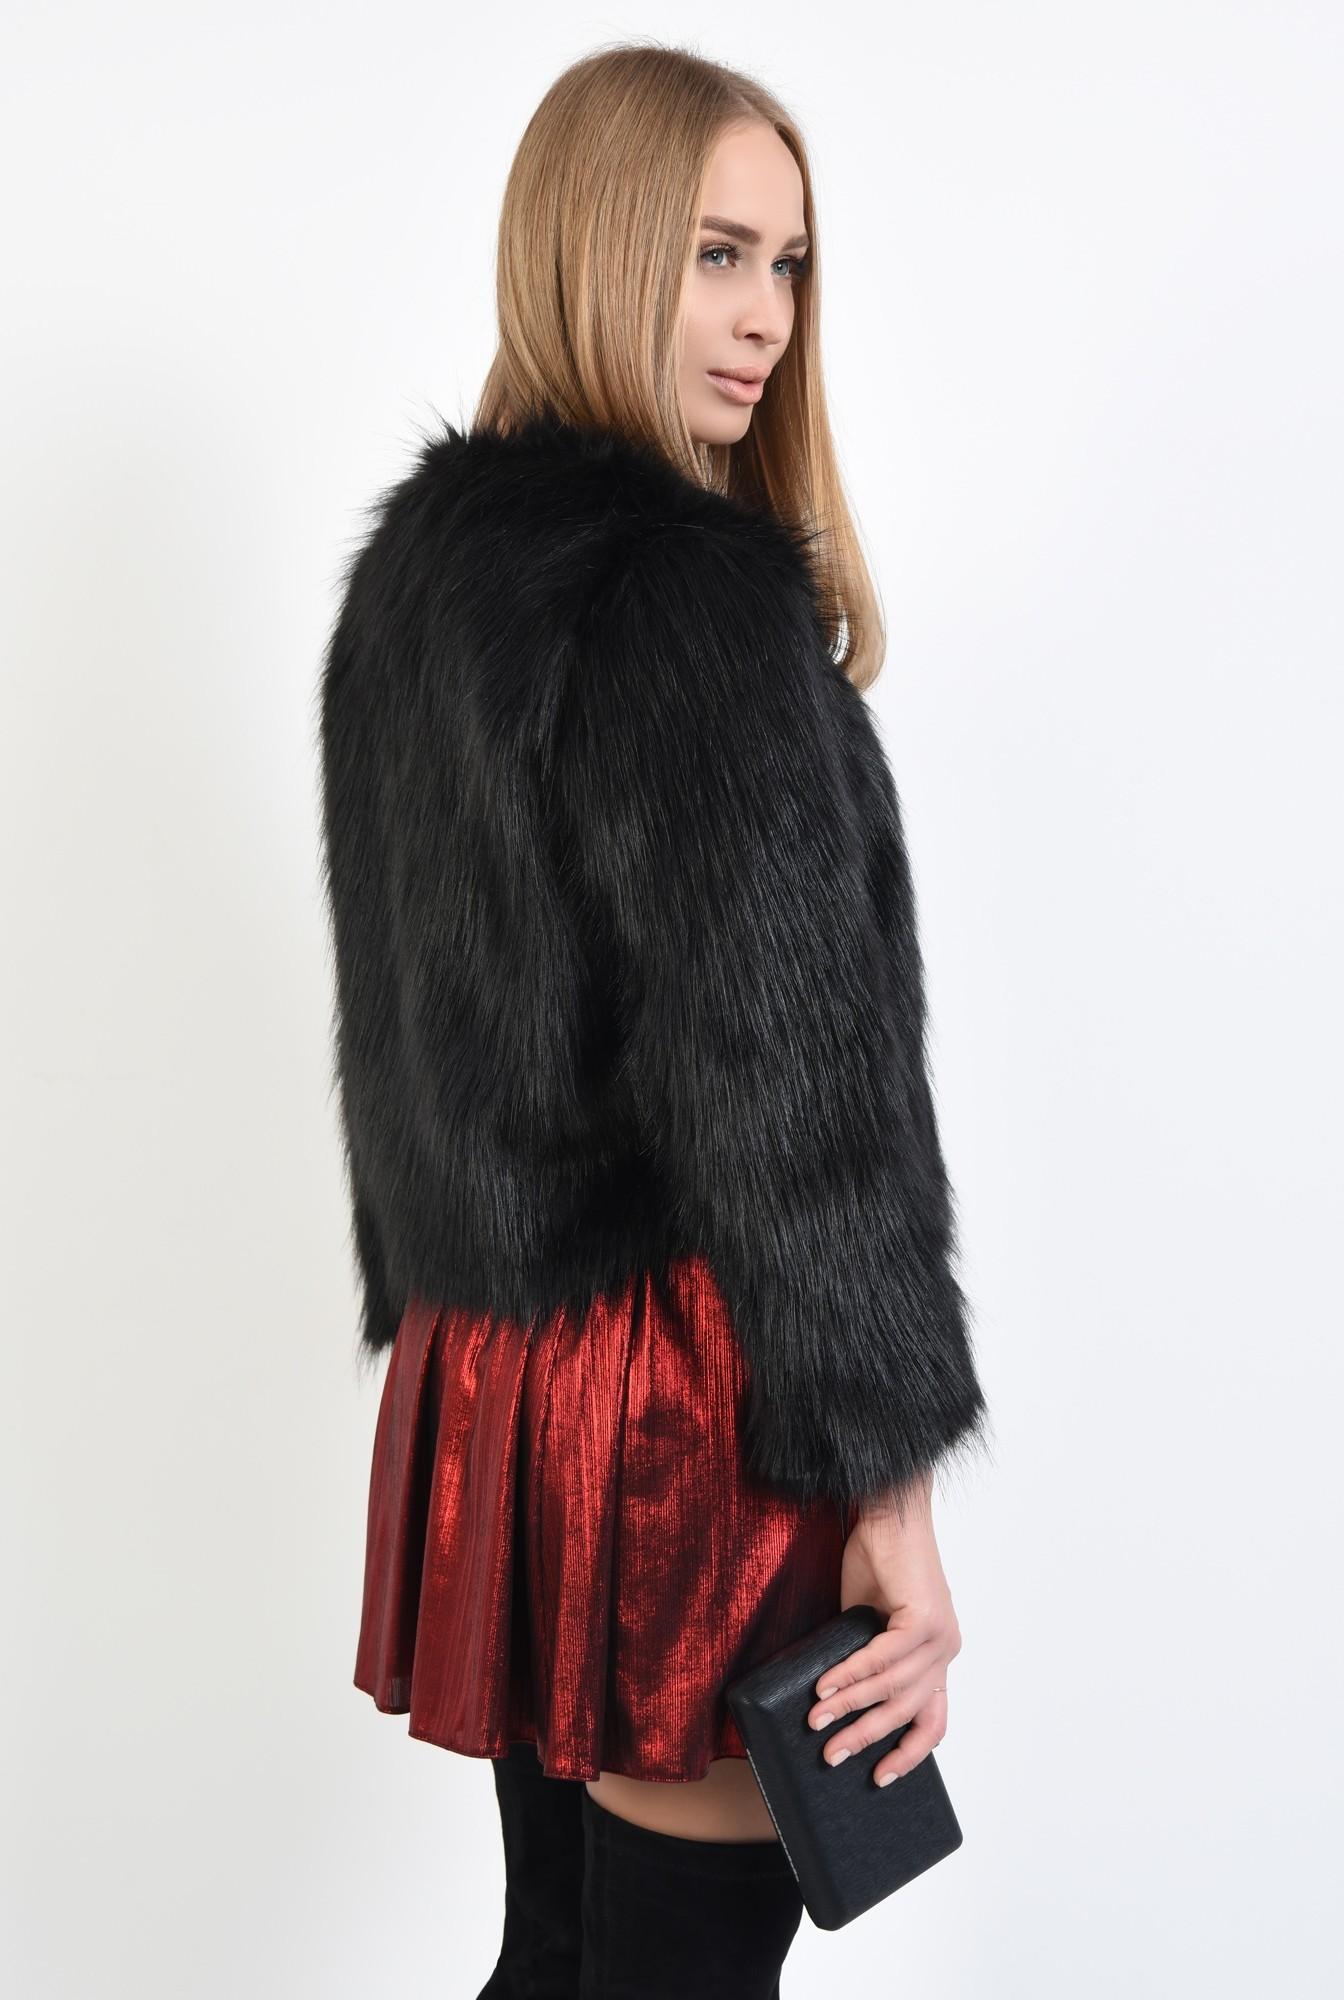 1 - haina de blana, neagra, jacheta dama, bolero blana online